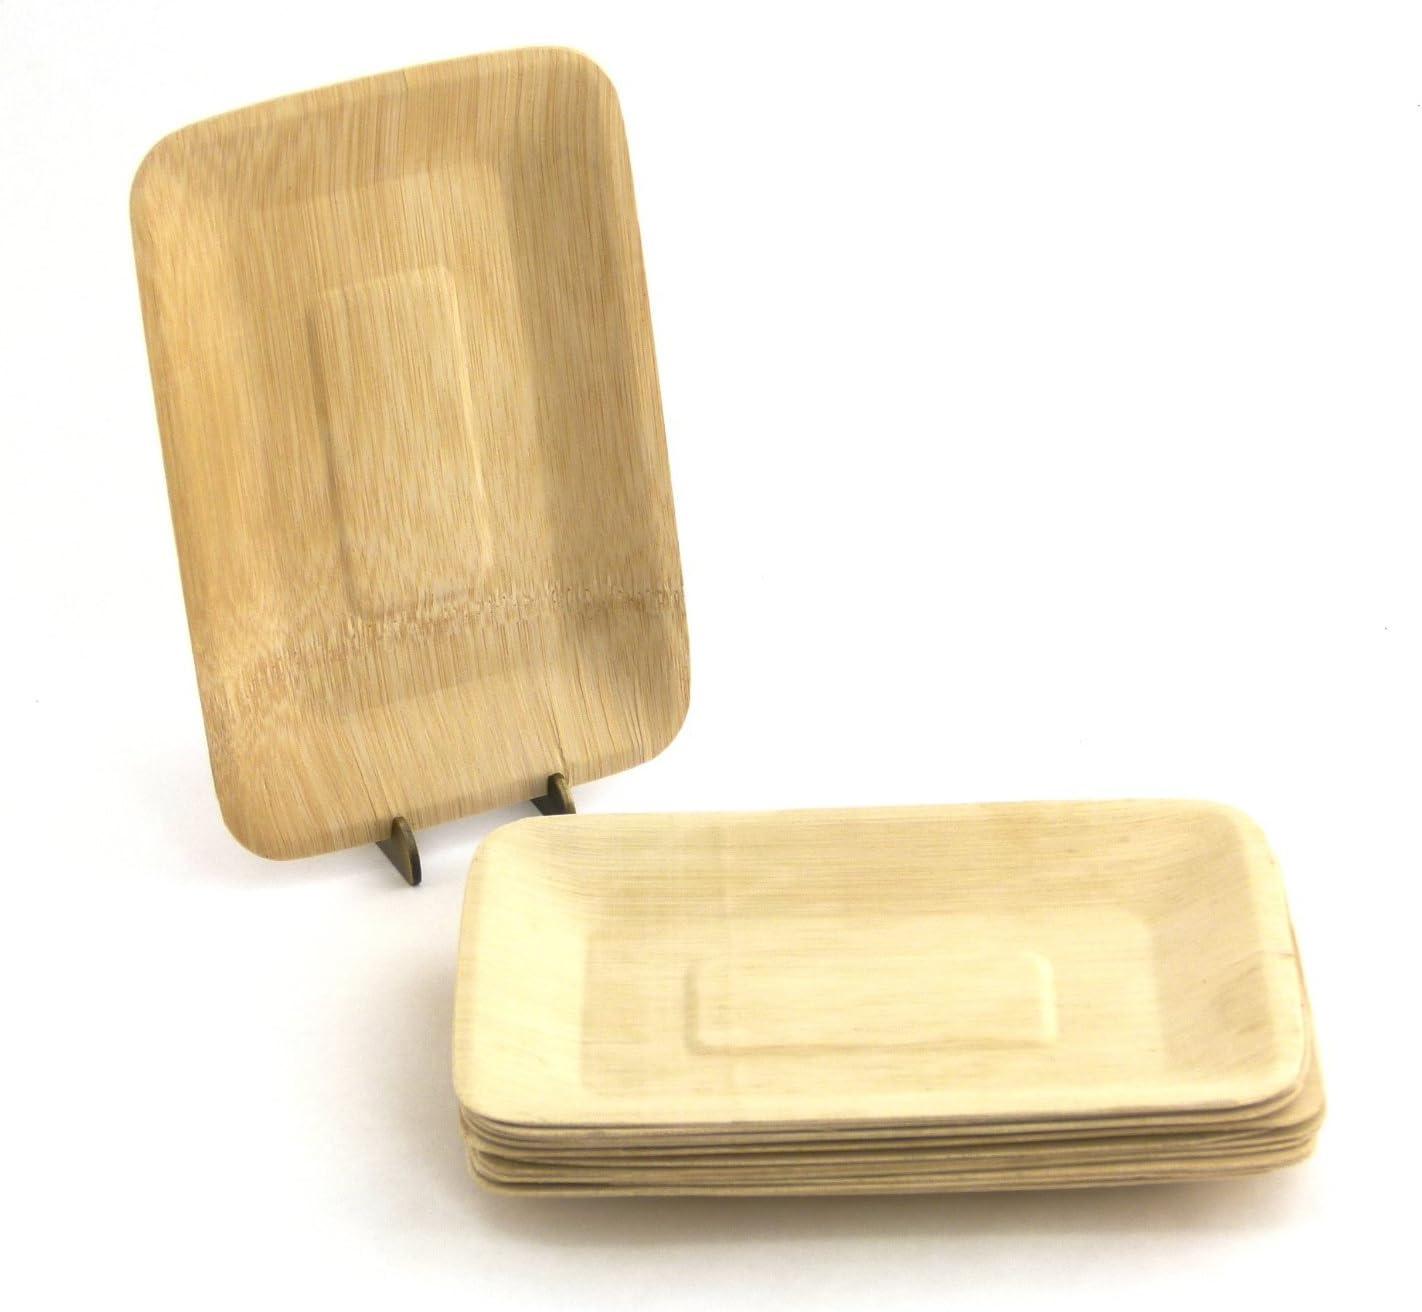 "B01E5TO9FI BambooMN Brand - 7.3"" x 5"" Rectangle Disposable Bamboo Veneer Plates, 96pcs 719KrzpyllL"